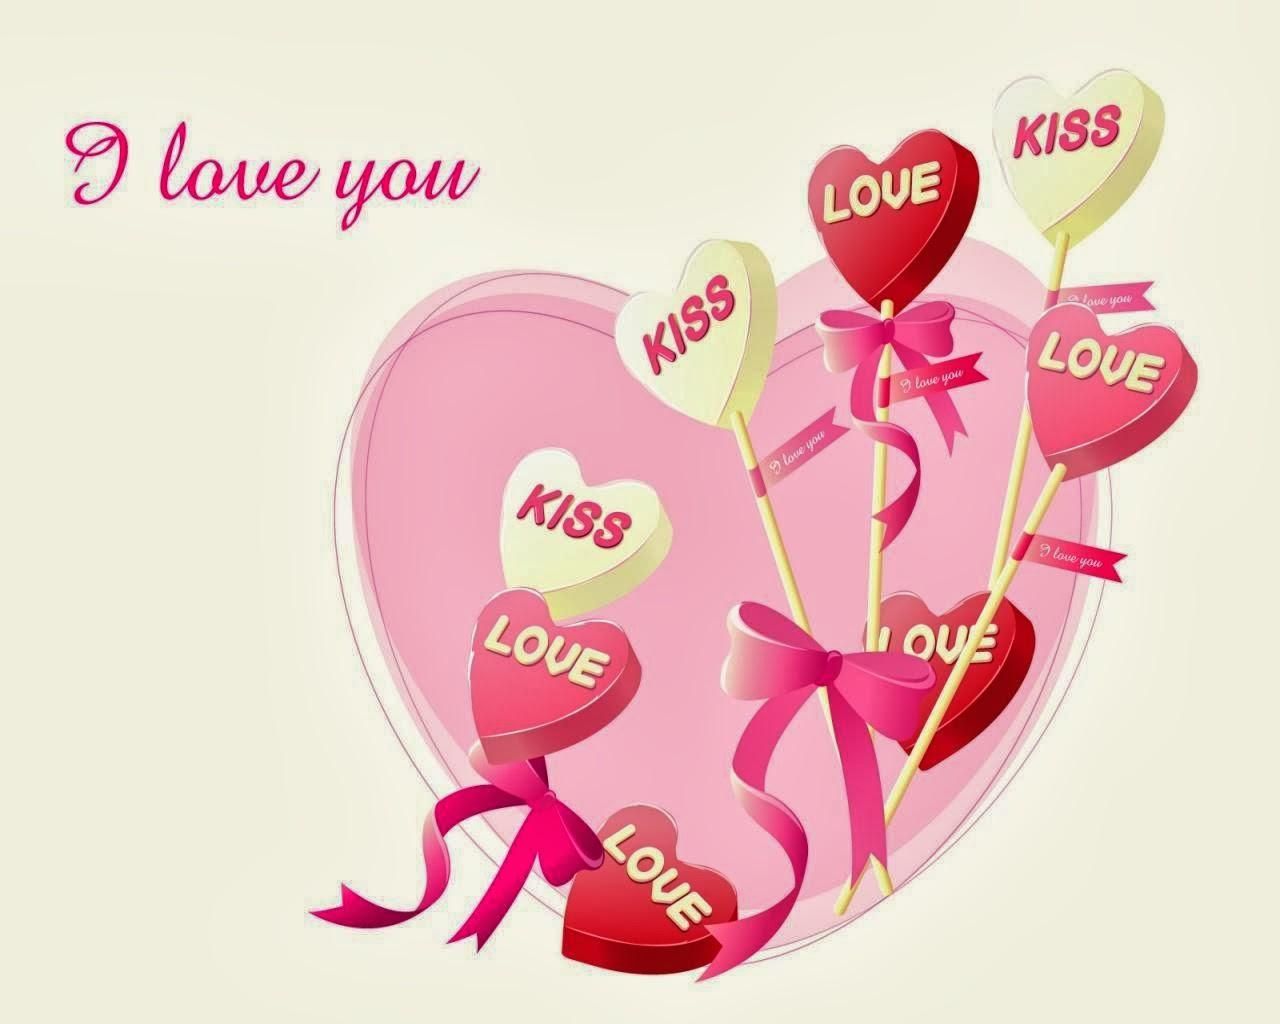 Kata Kata Mutiara Dan Kata Kata Bijak Cinta